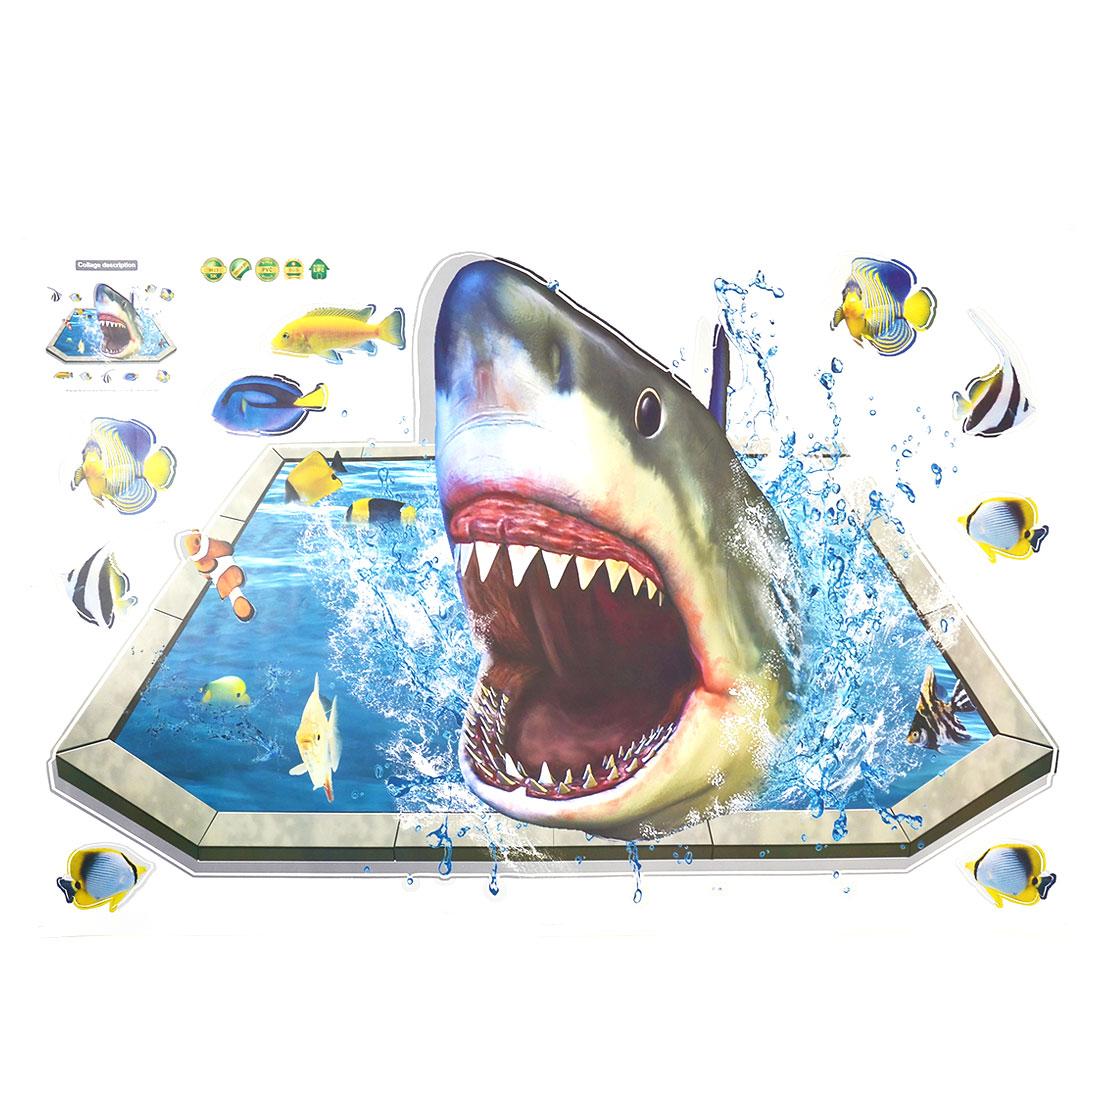 Living Room PVC Shark Fish Prints DIY Ornament Wall Sticker Decal Mural 60 x 90cm